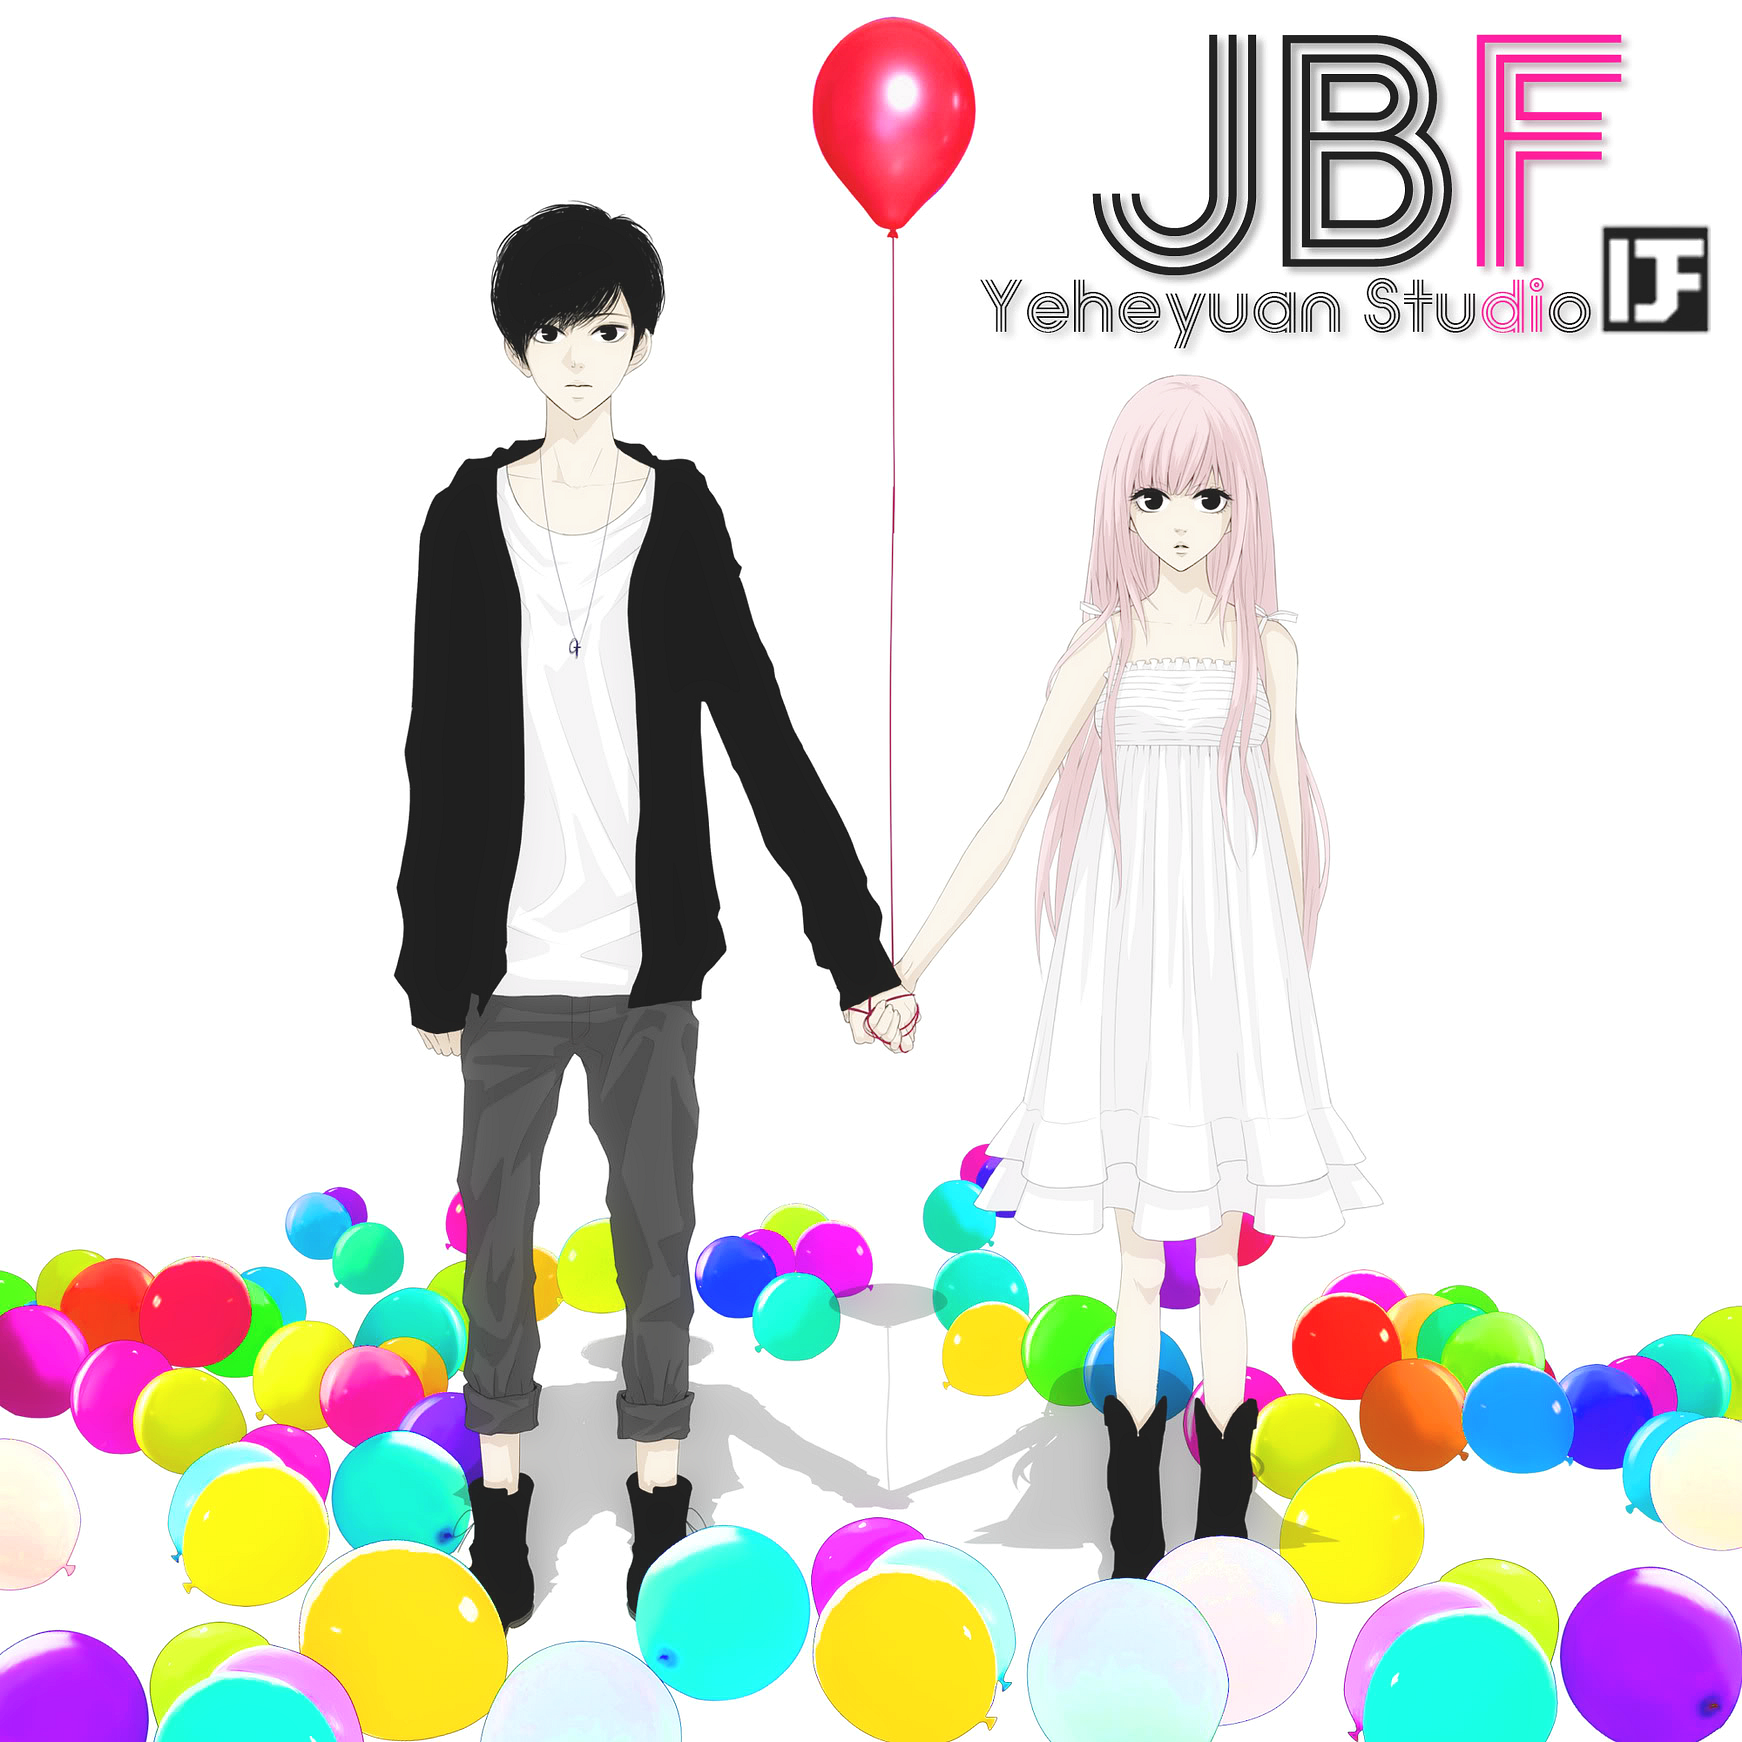 Just Be Friends | Vocaloid Lyrics Wiki | FANDOM powered by Wikia